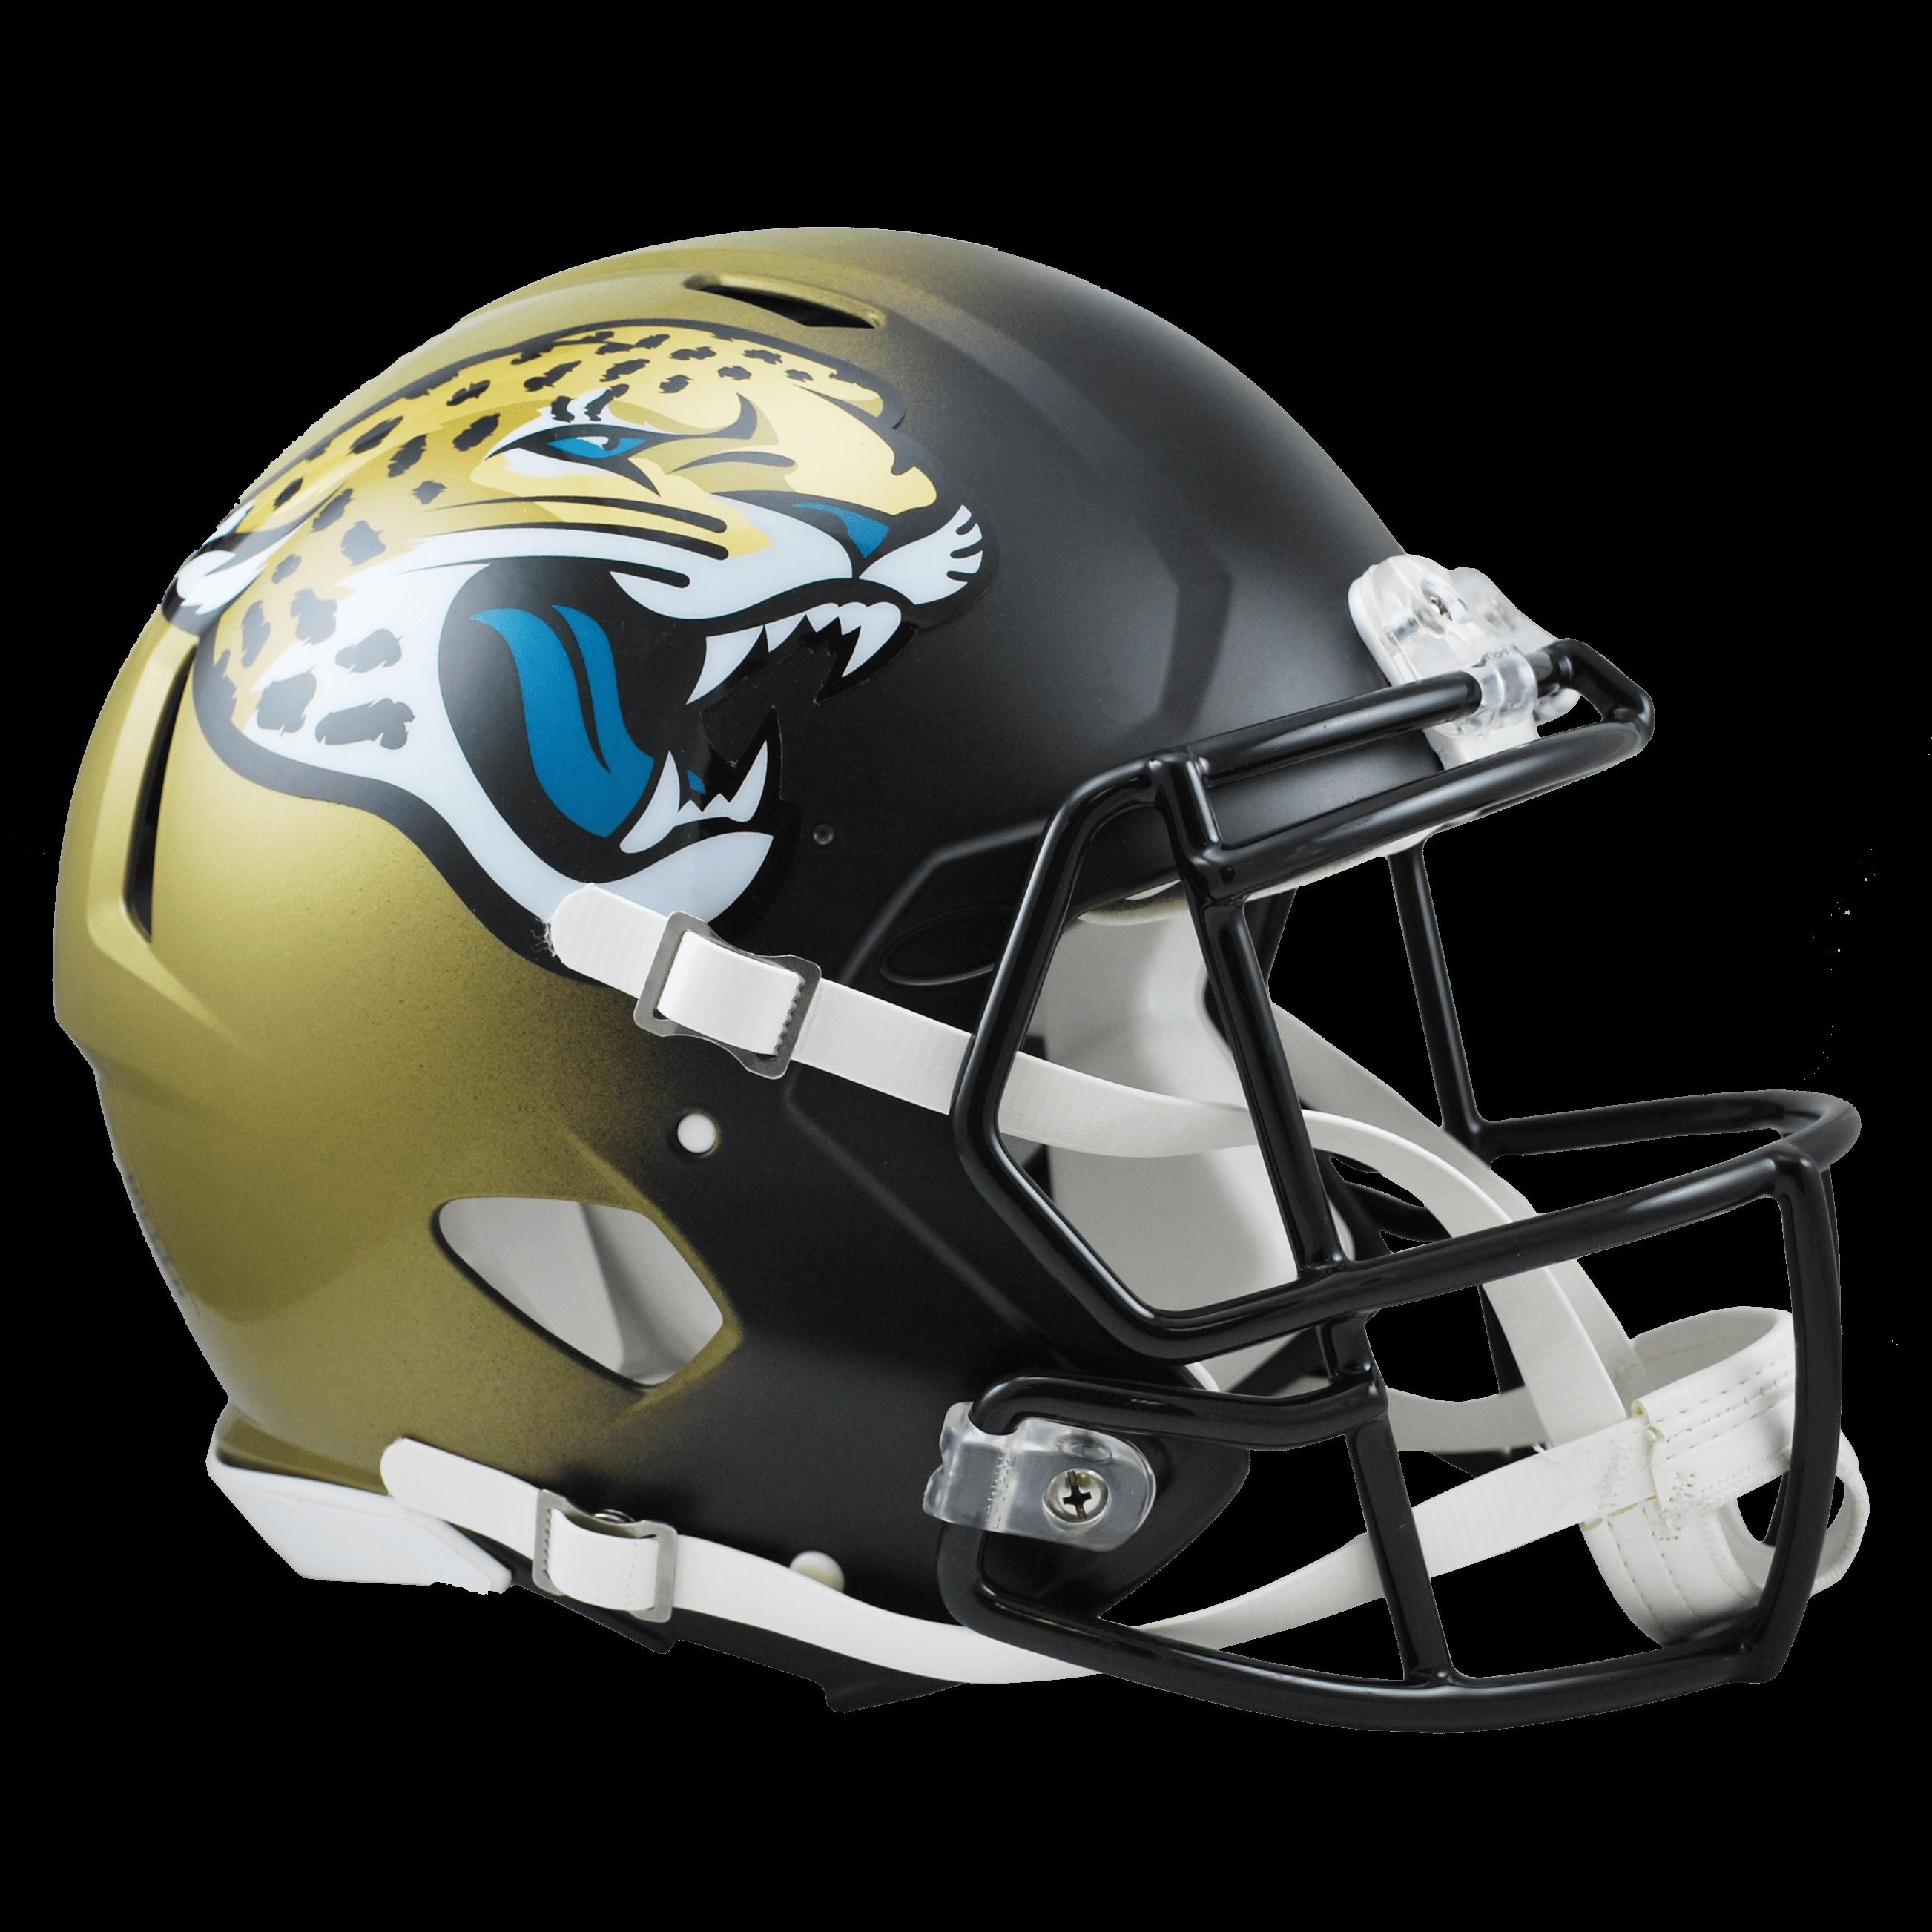 Jaguar football clipart graphic library library Jacksonville Jaguars Player transparent PNG - StickPNG graphic library library